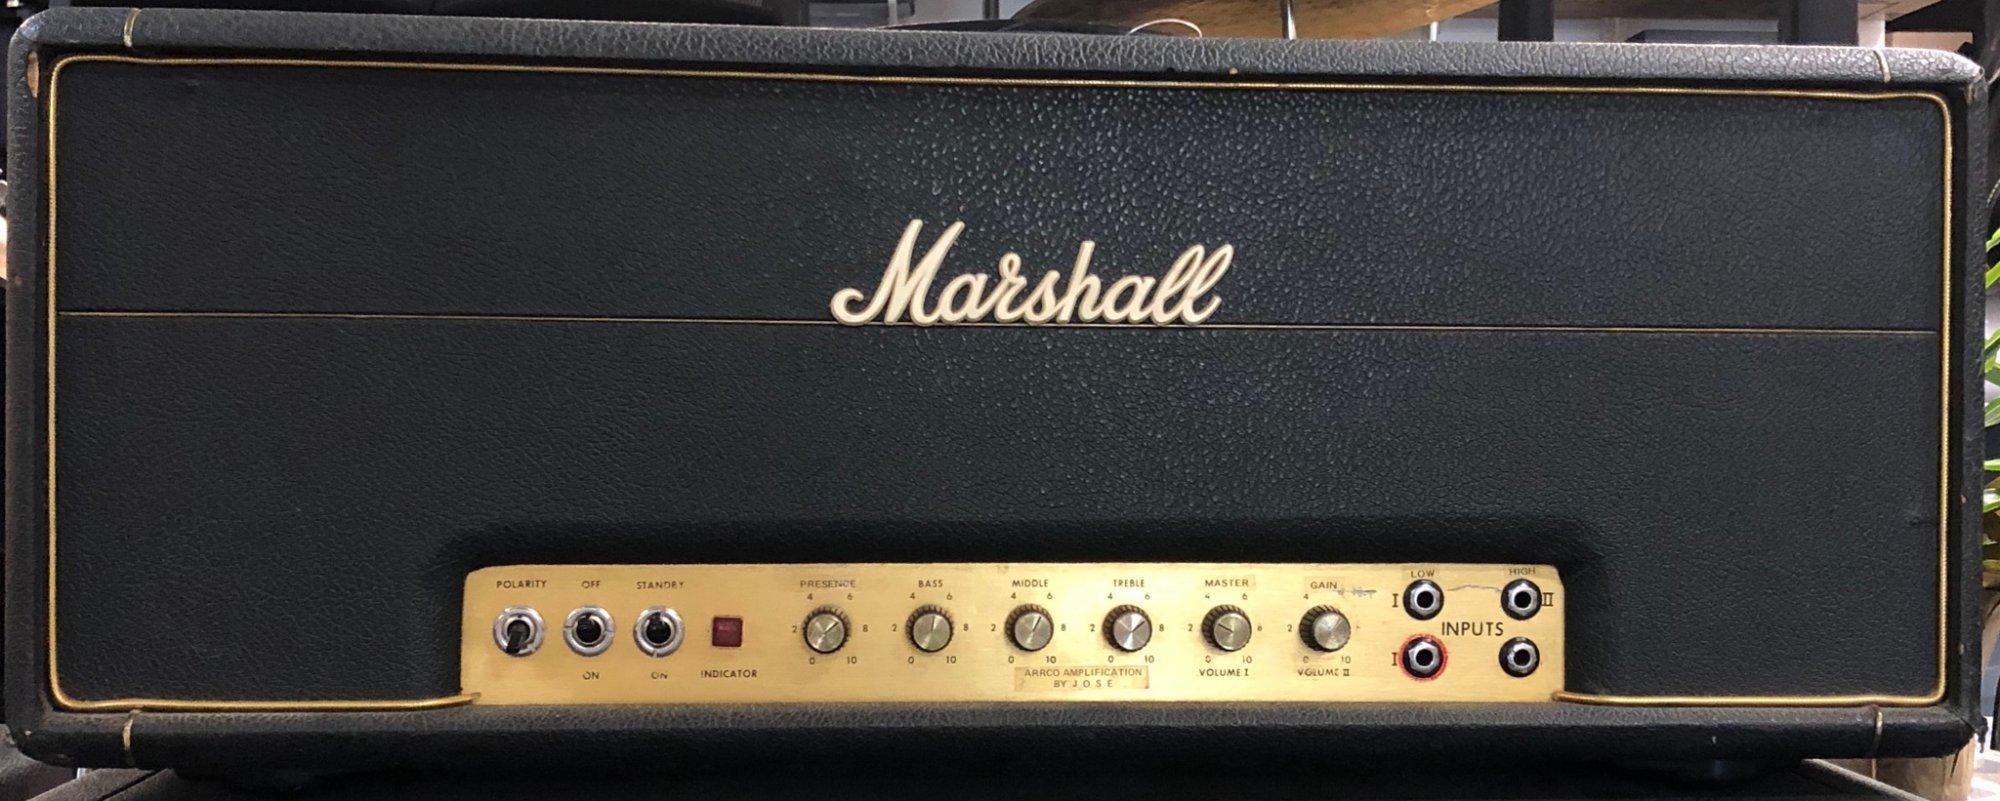 MARSHALL 50/100 W HEAD